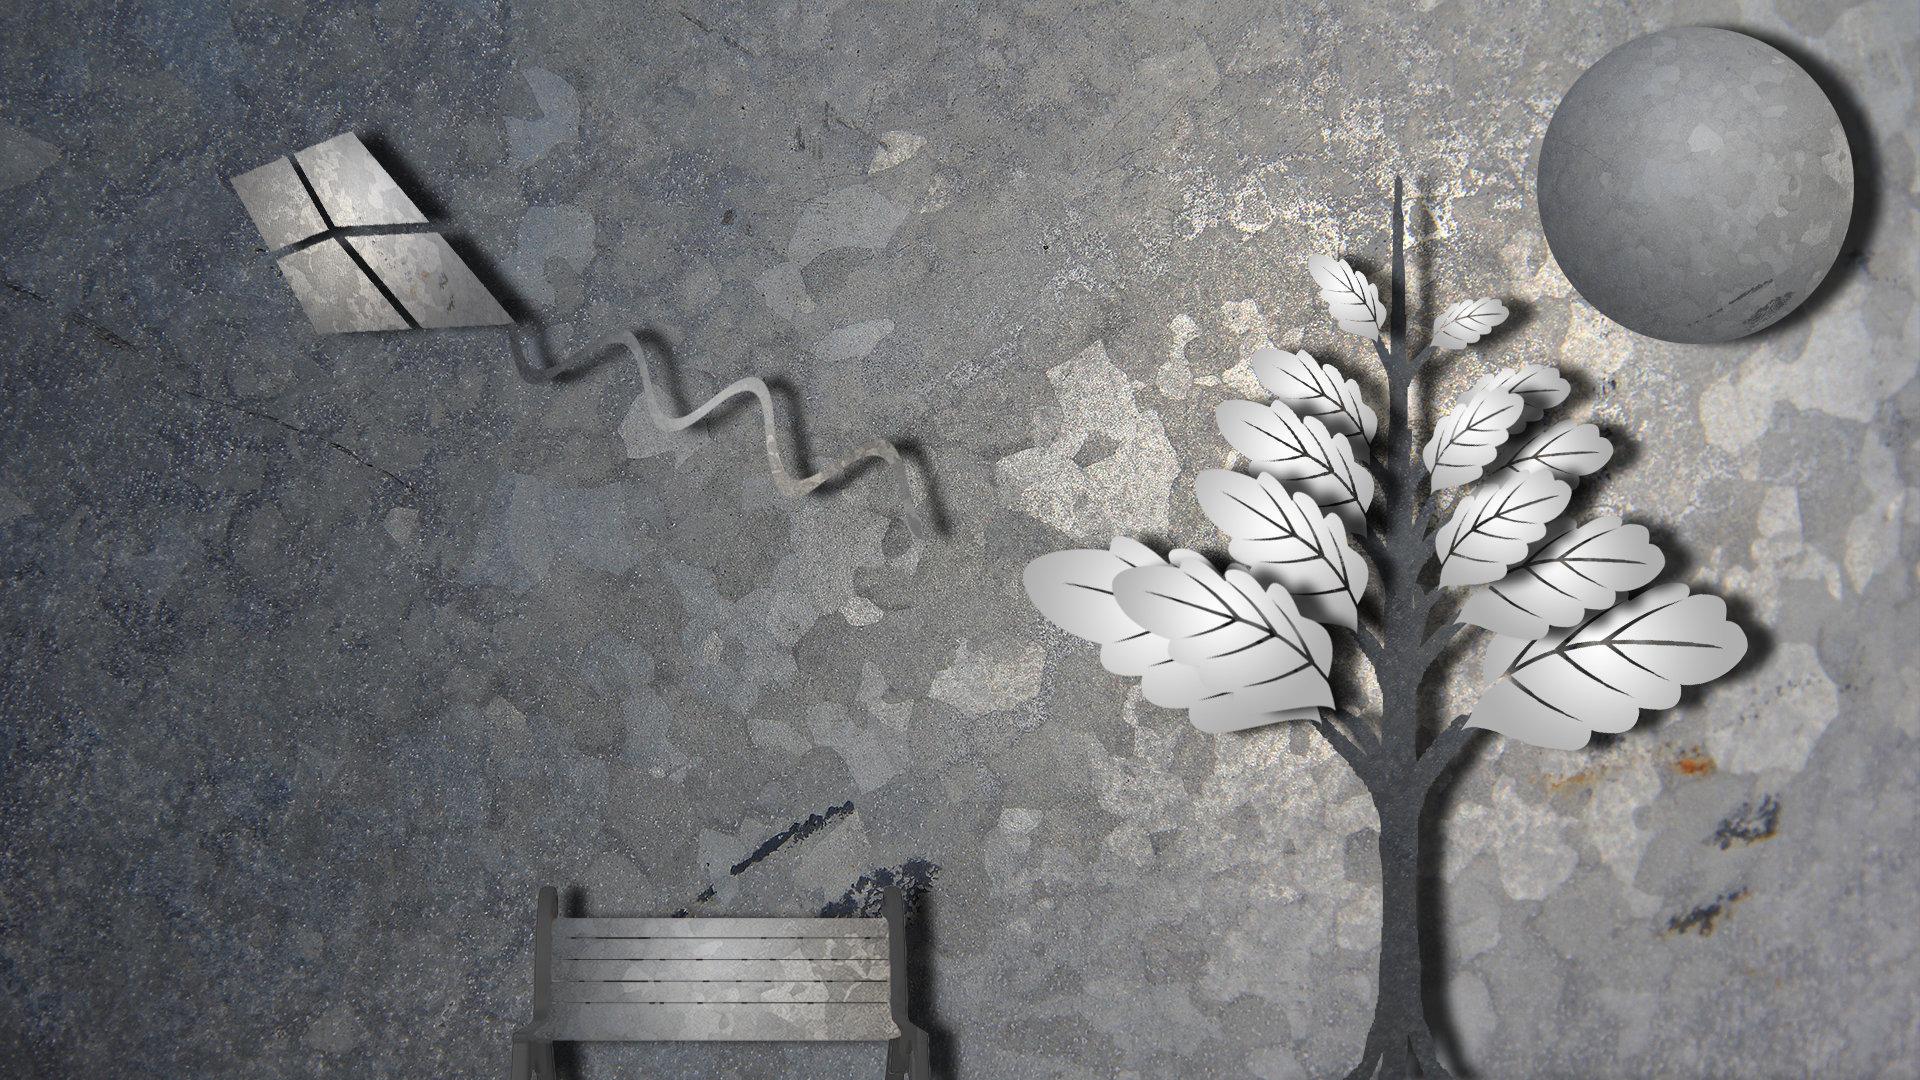 Abstract Tree Kite Bench Gray Grey Nature Bench Wallpaper